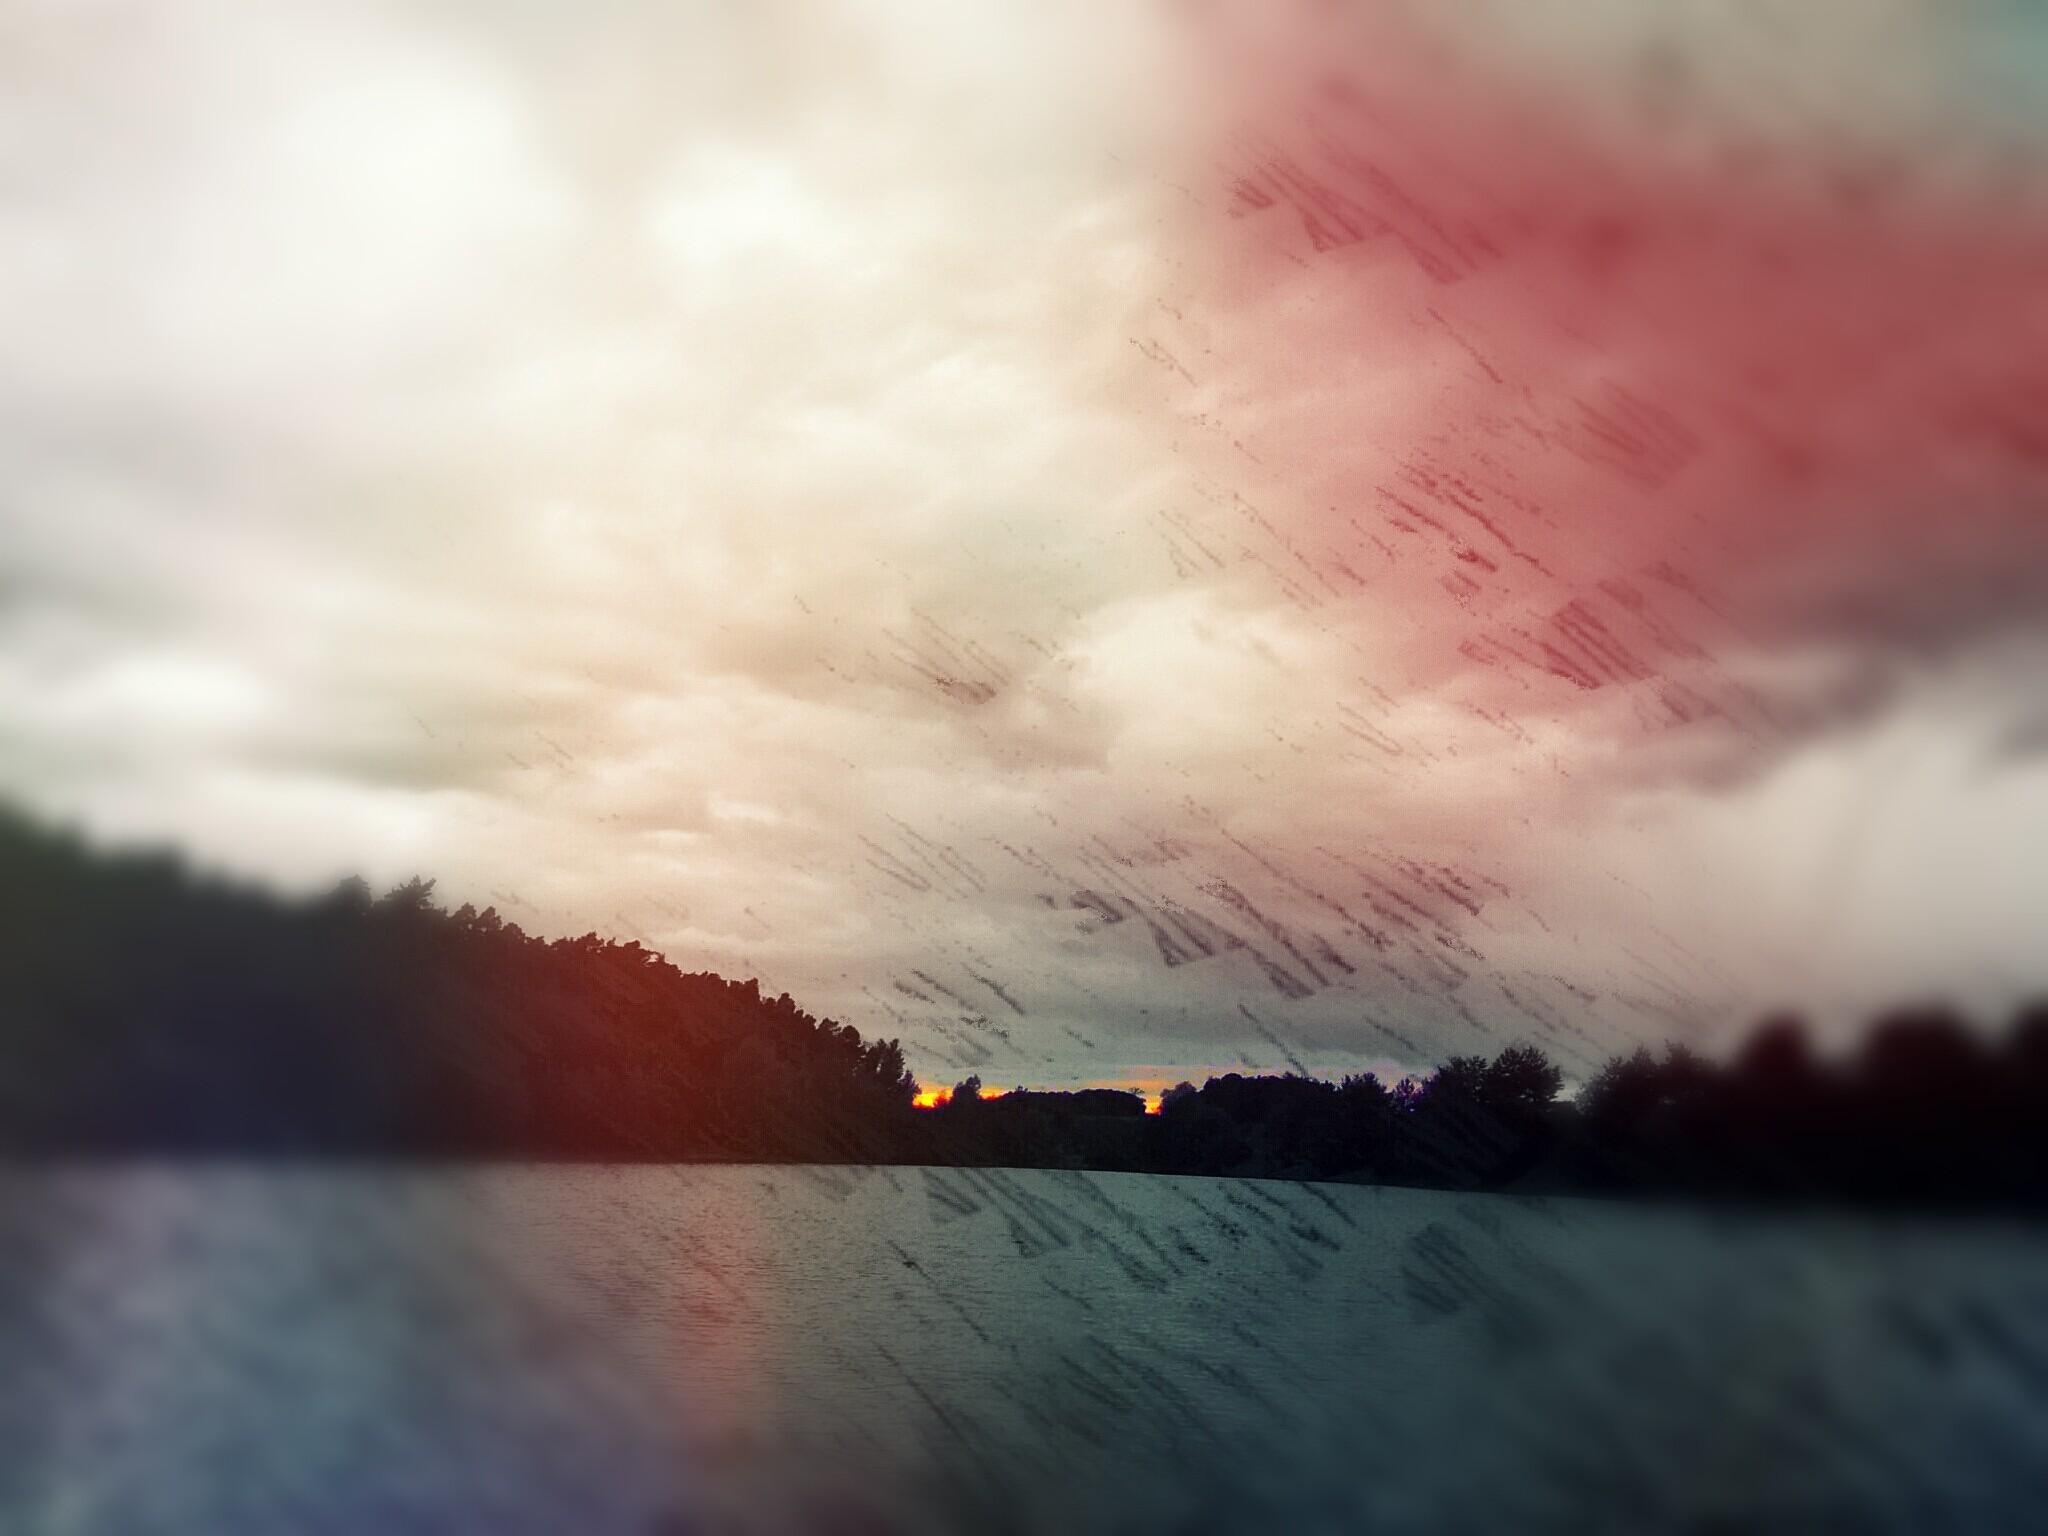 TITEL: Rode wolken in de lucht...... LOCATION: Baggersee Erlangen Germany..... ©Copyright by Kalki Kalkbrenner™